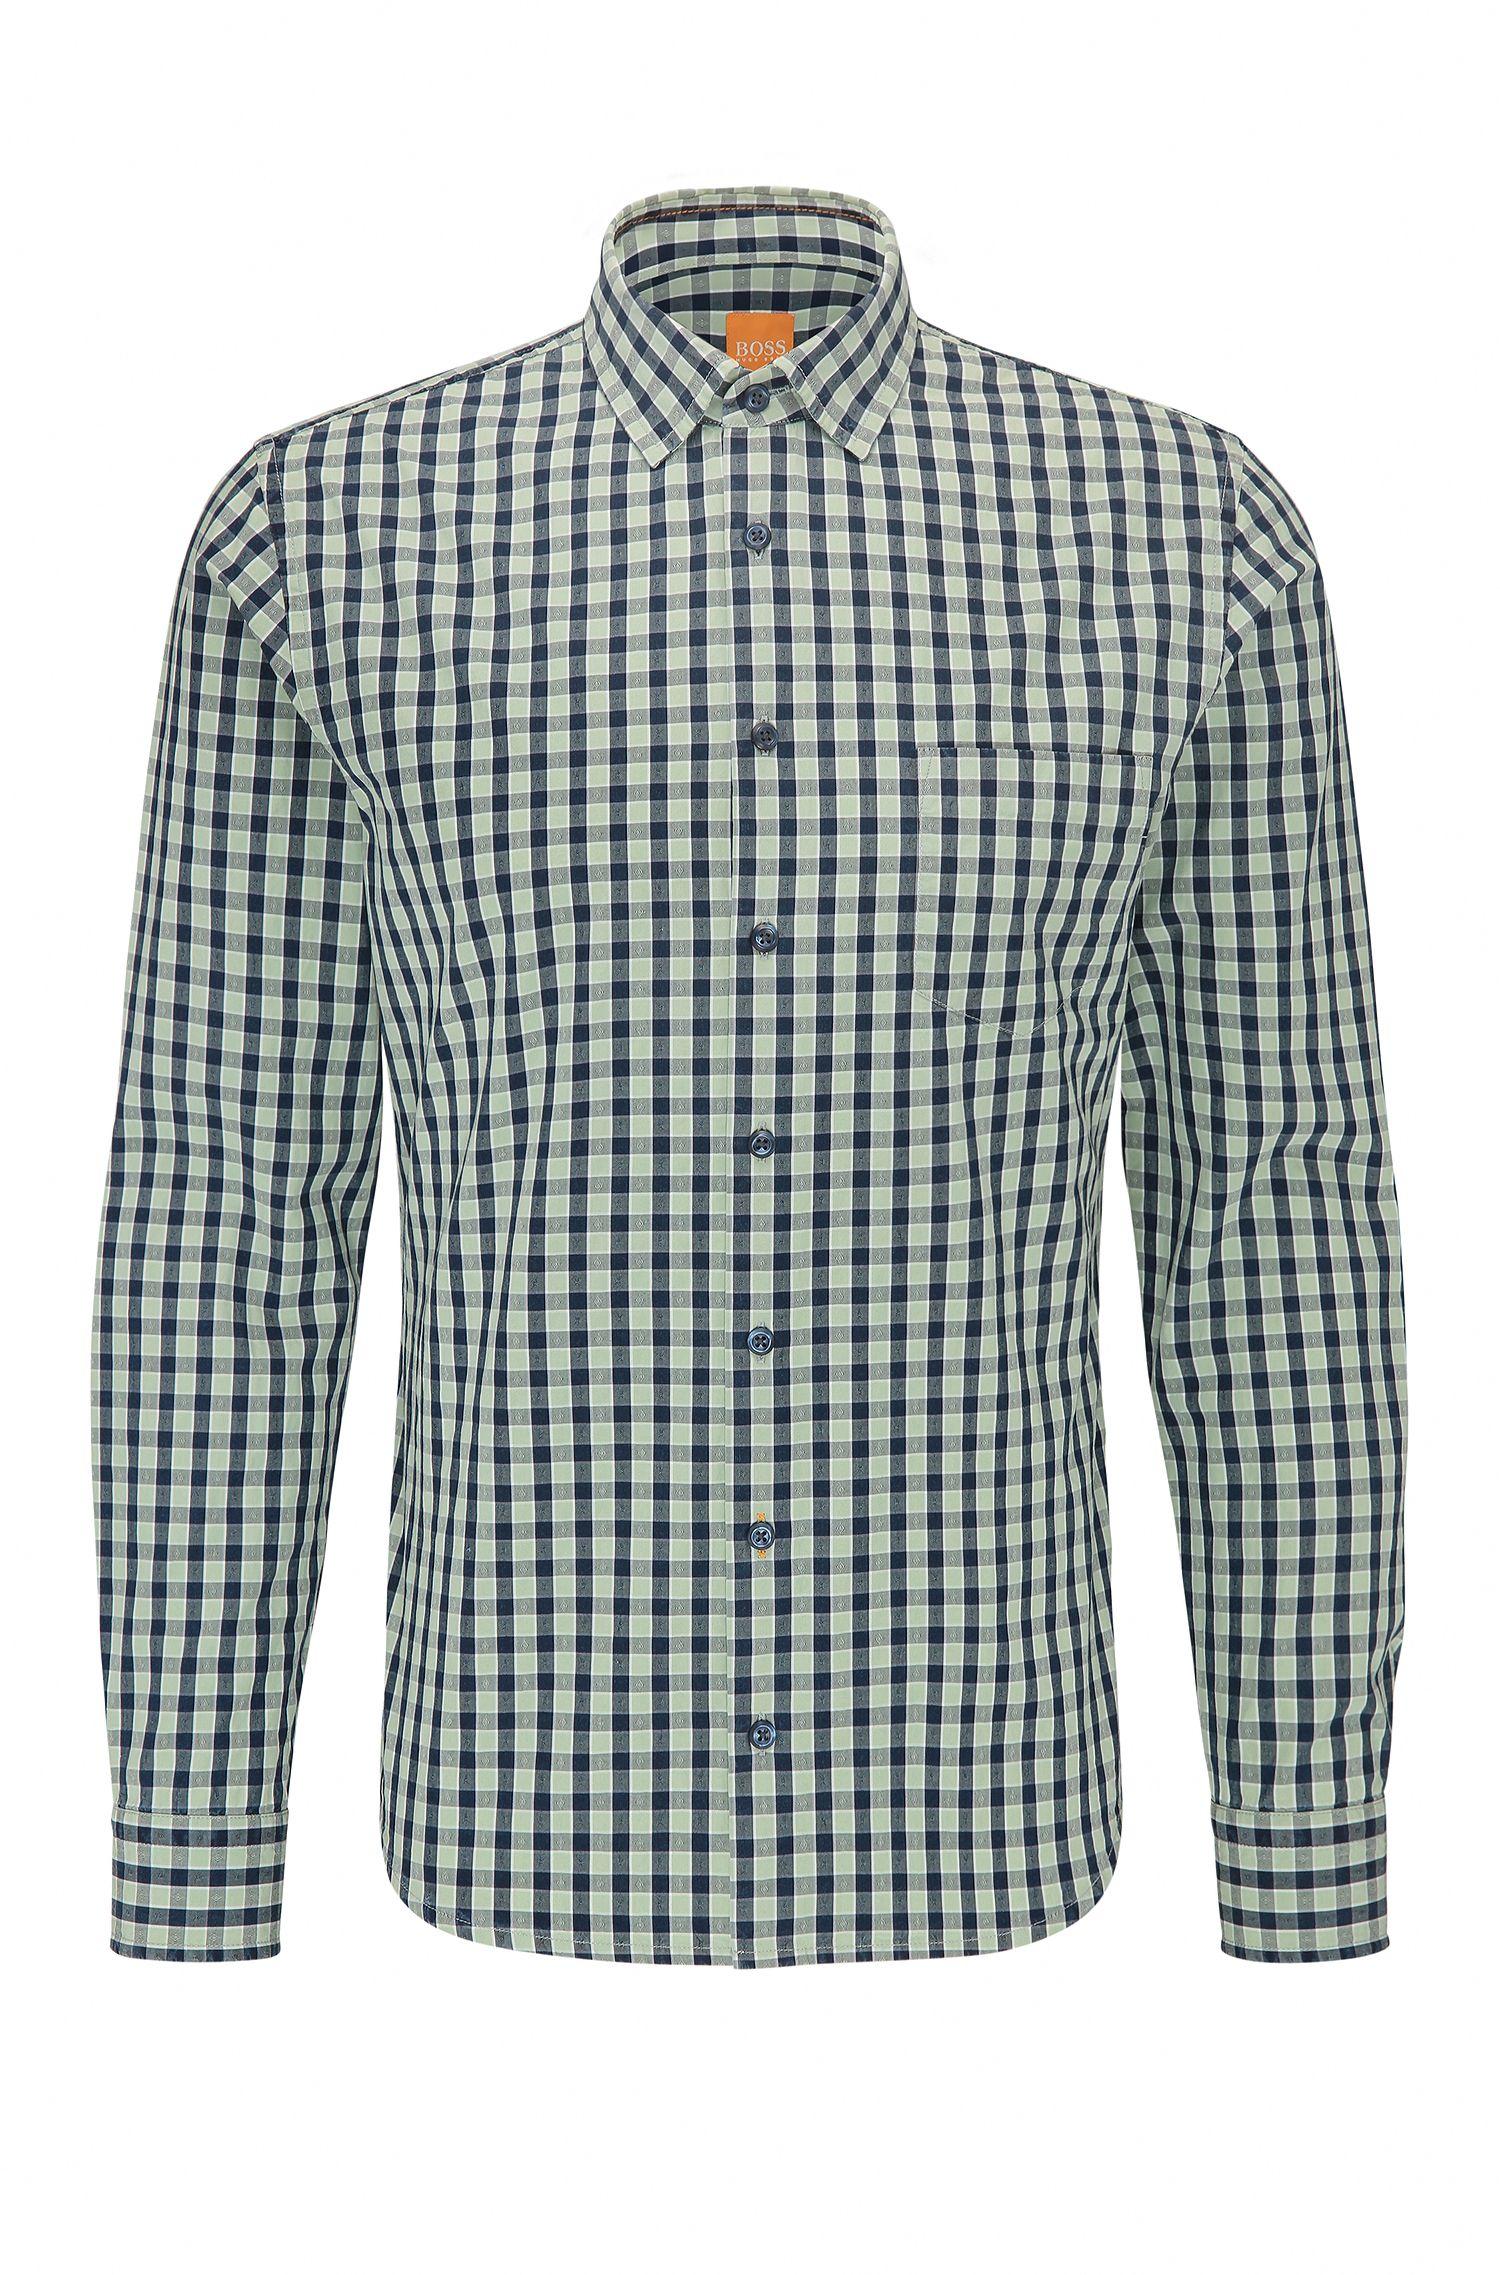 Gingham Cotton Button-Down Shirt, Slim Fit | Epop